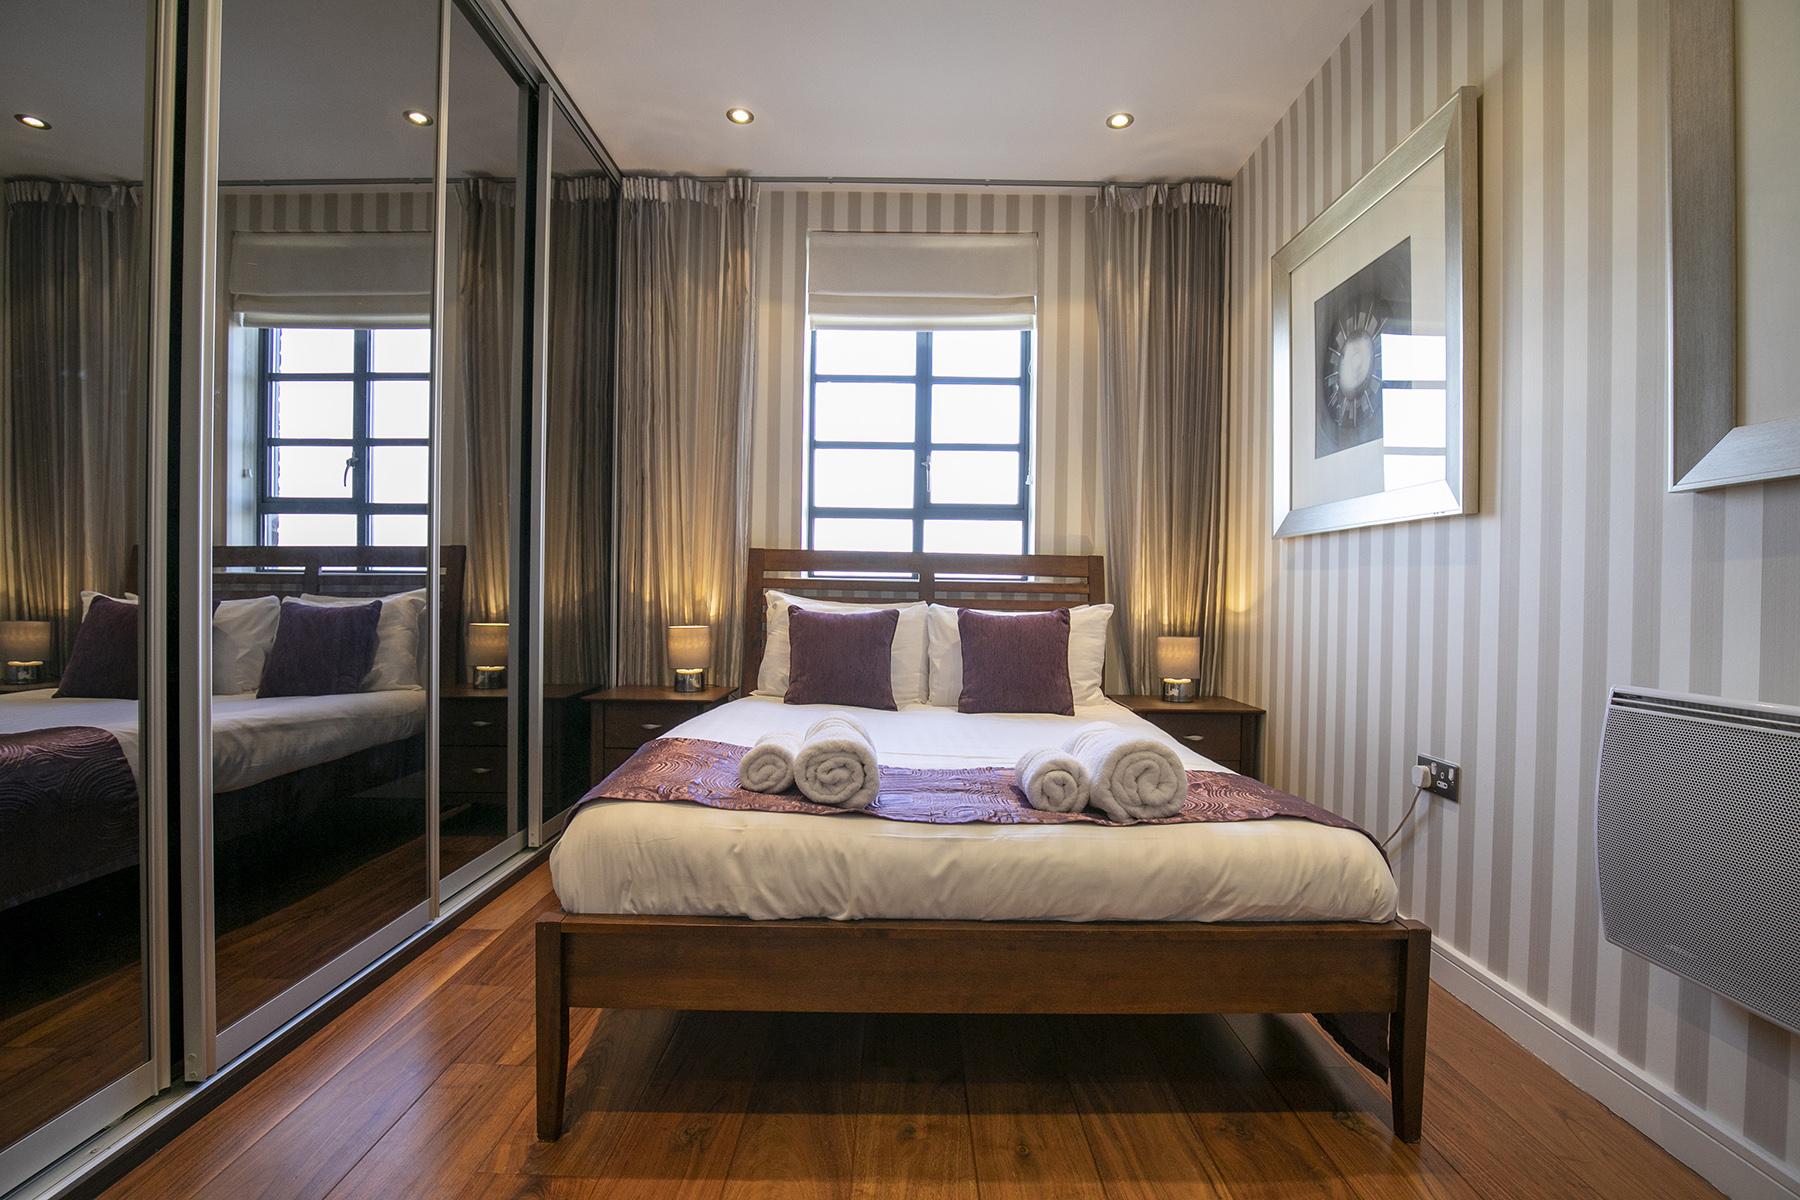 Sleep at Wallis Square Apartments, Centre, Farnborough - Citybase Apartments